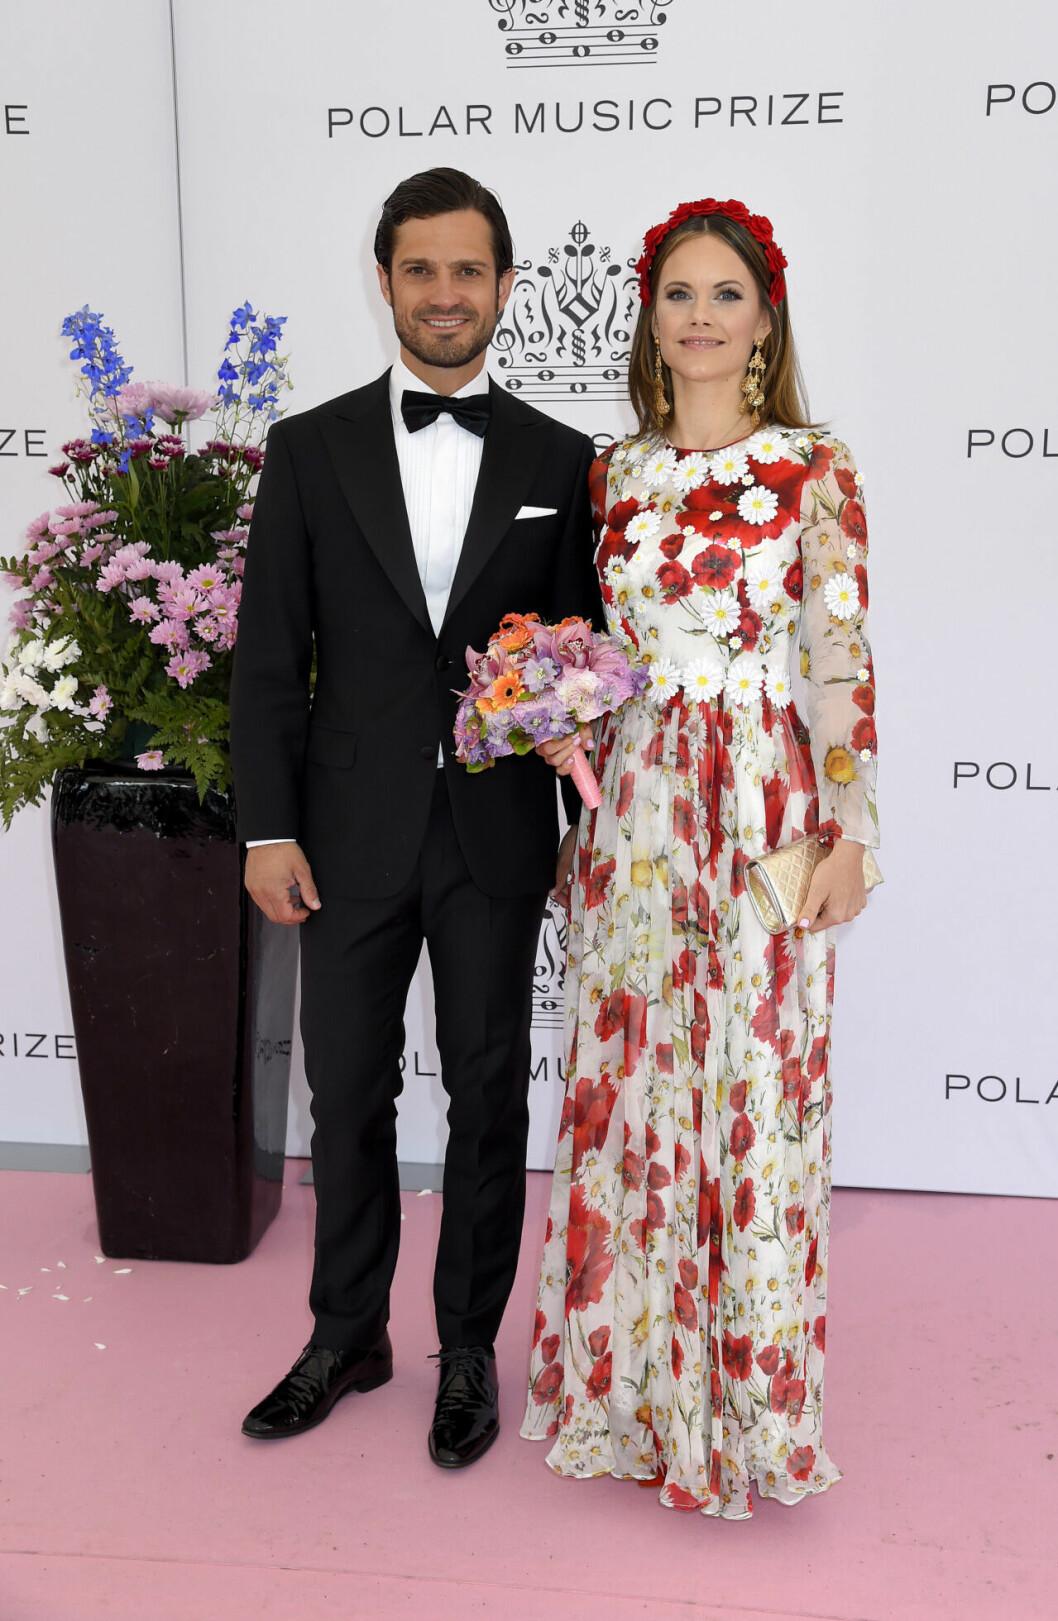 Prinsessan Sofia på Polarpriset 2019